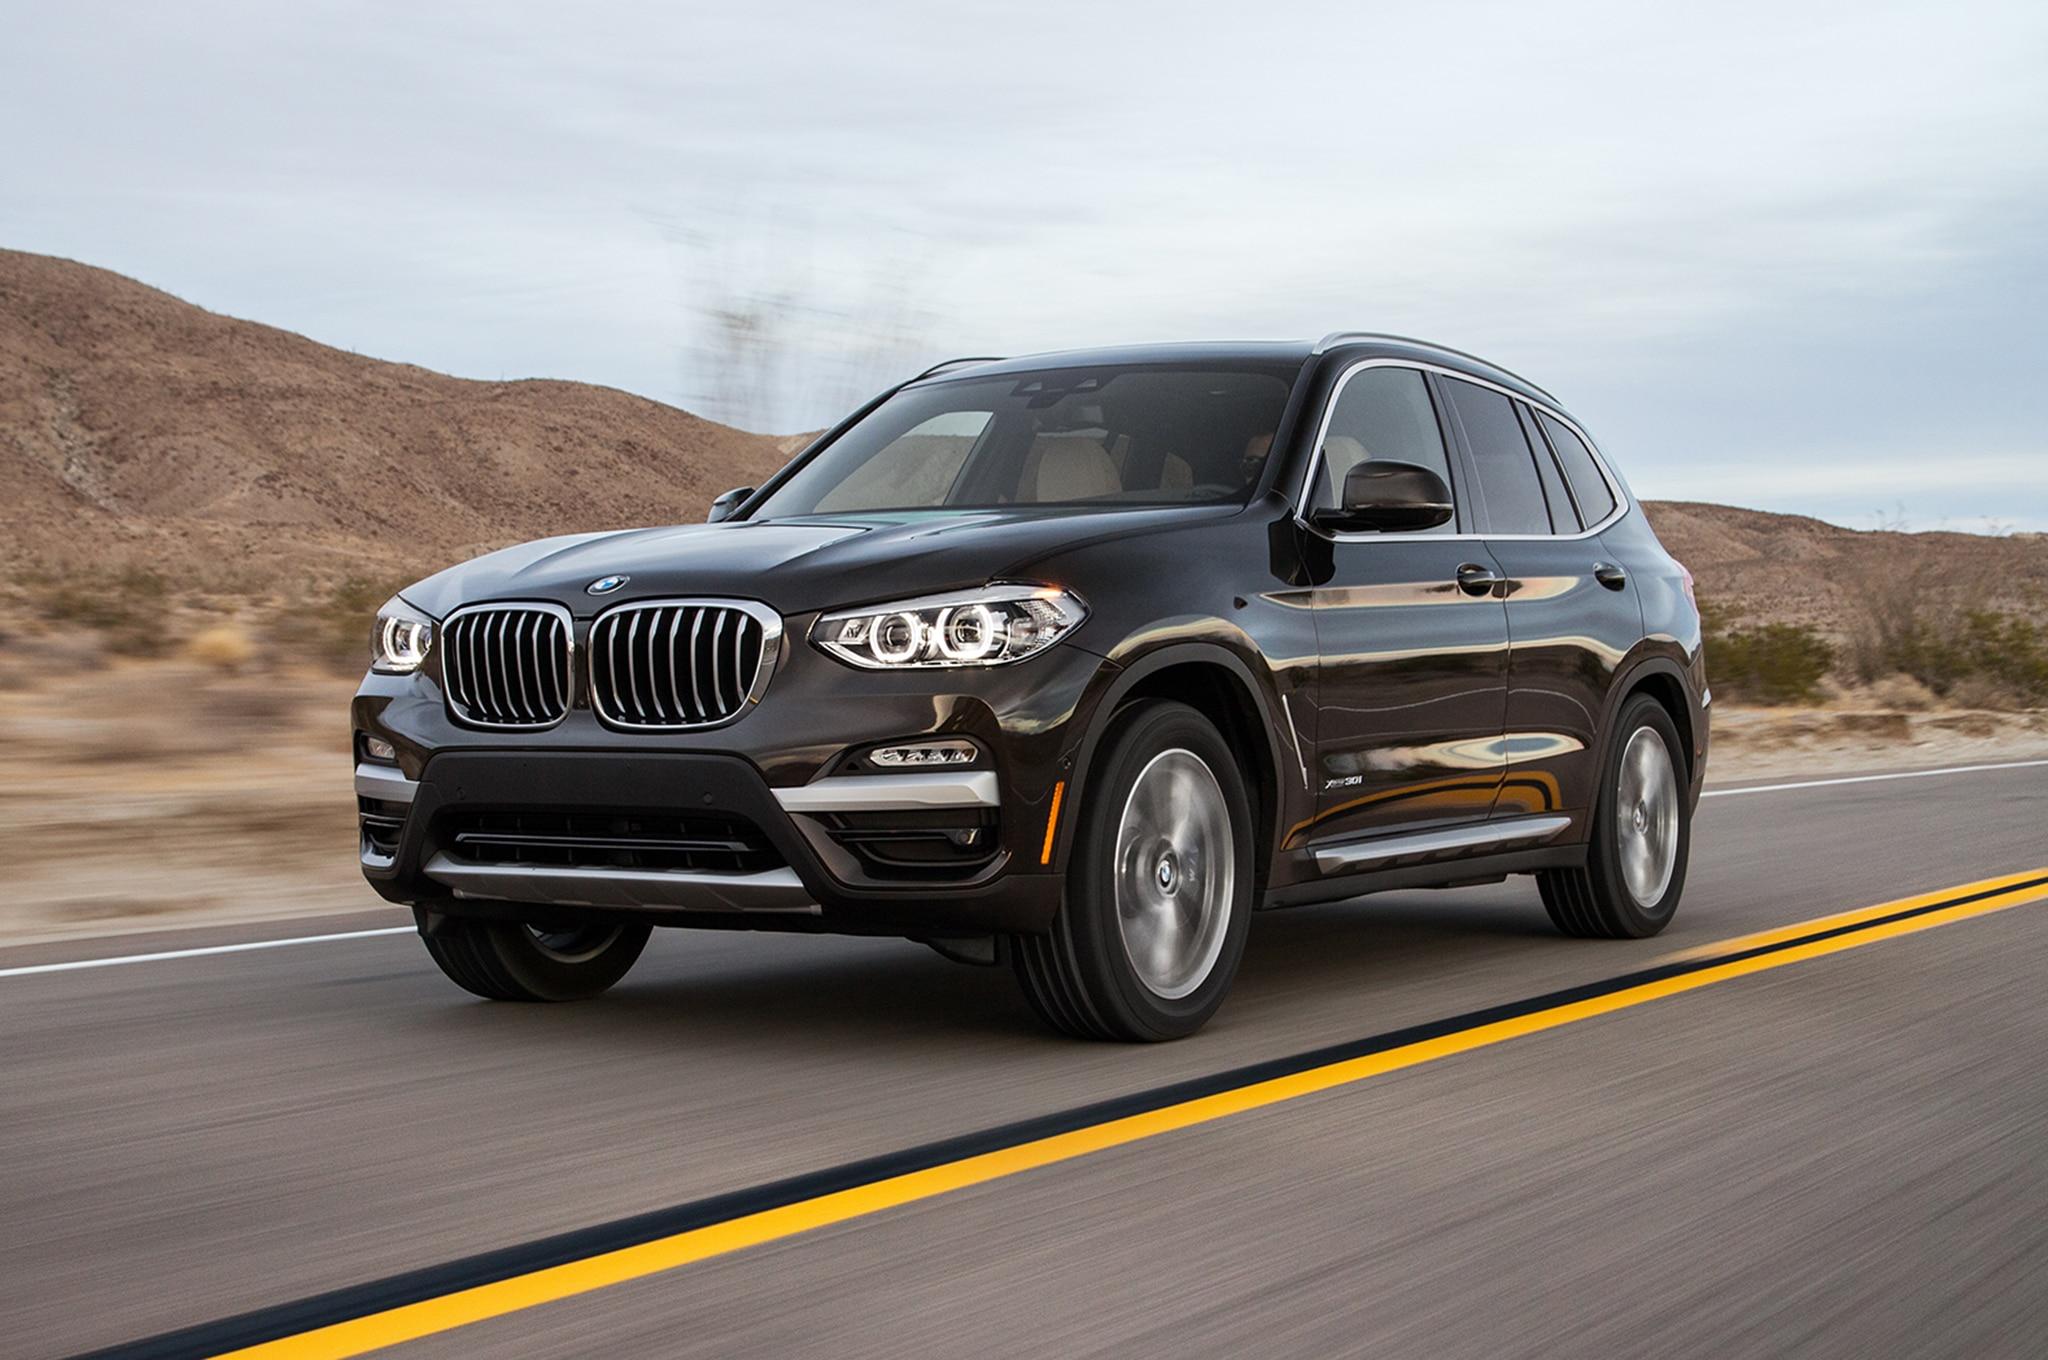 2018 BMW X3 Front Three Quarter In Motion 02